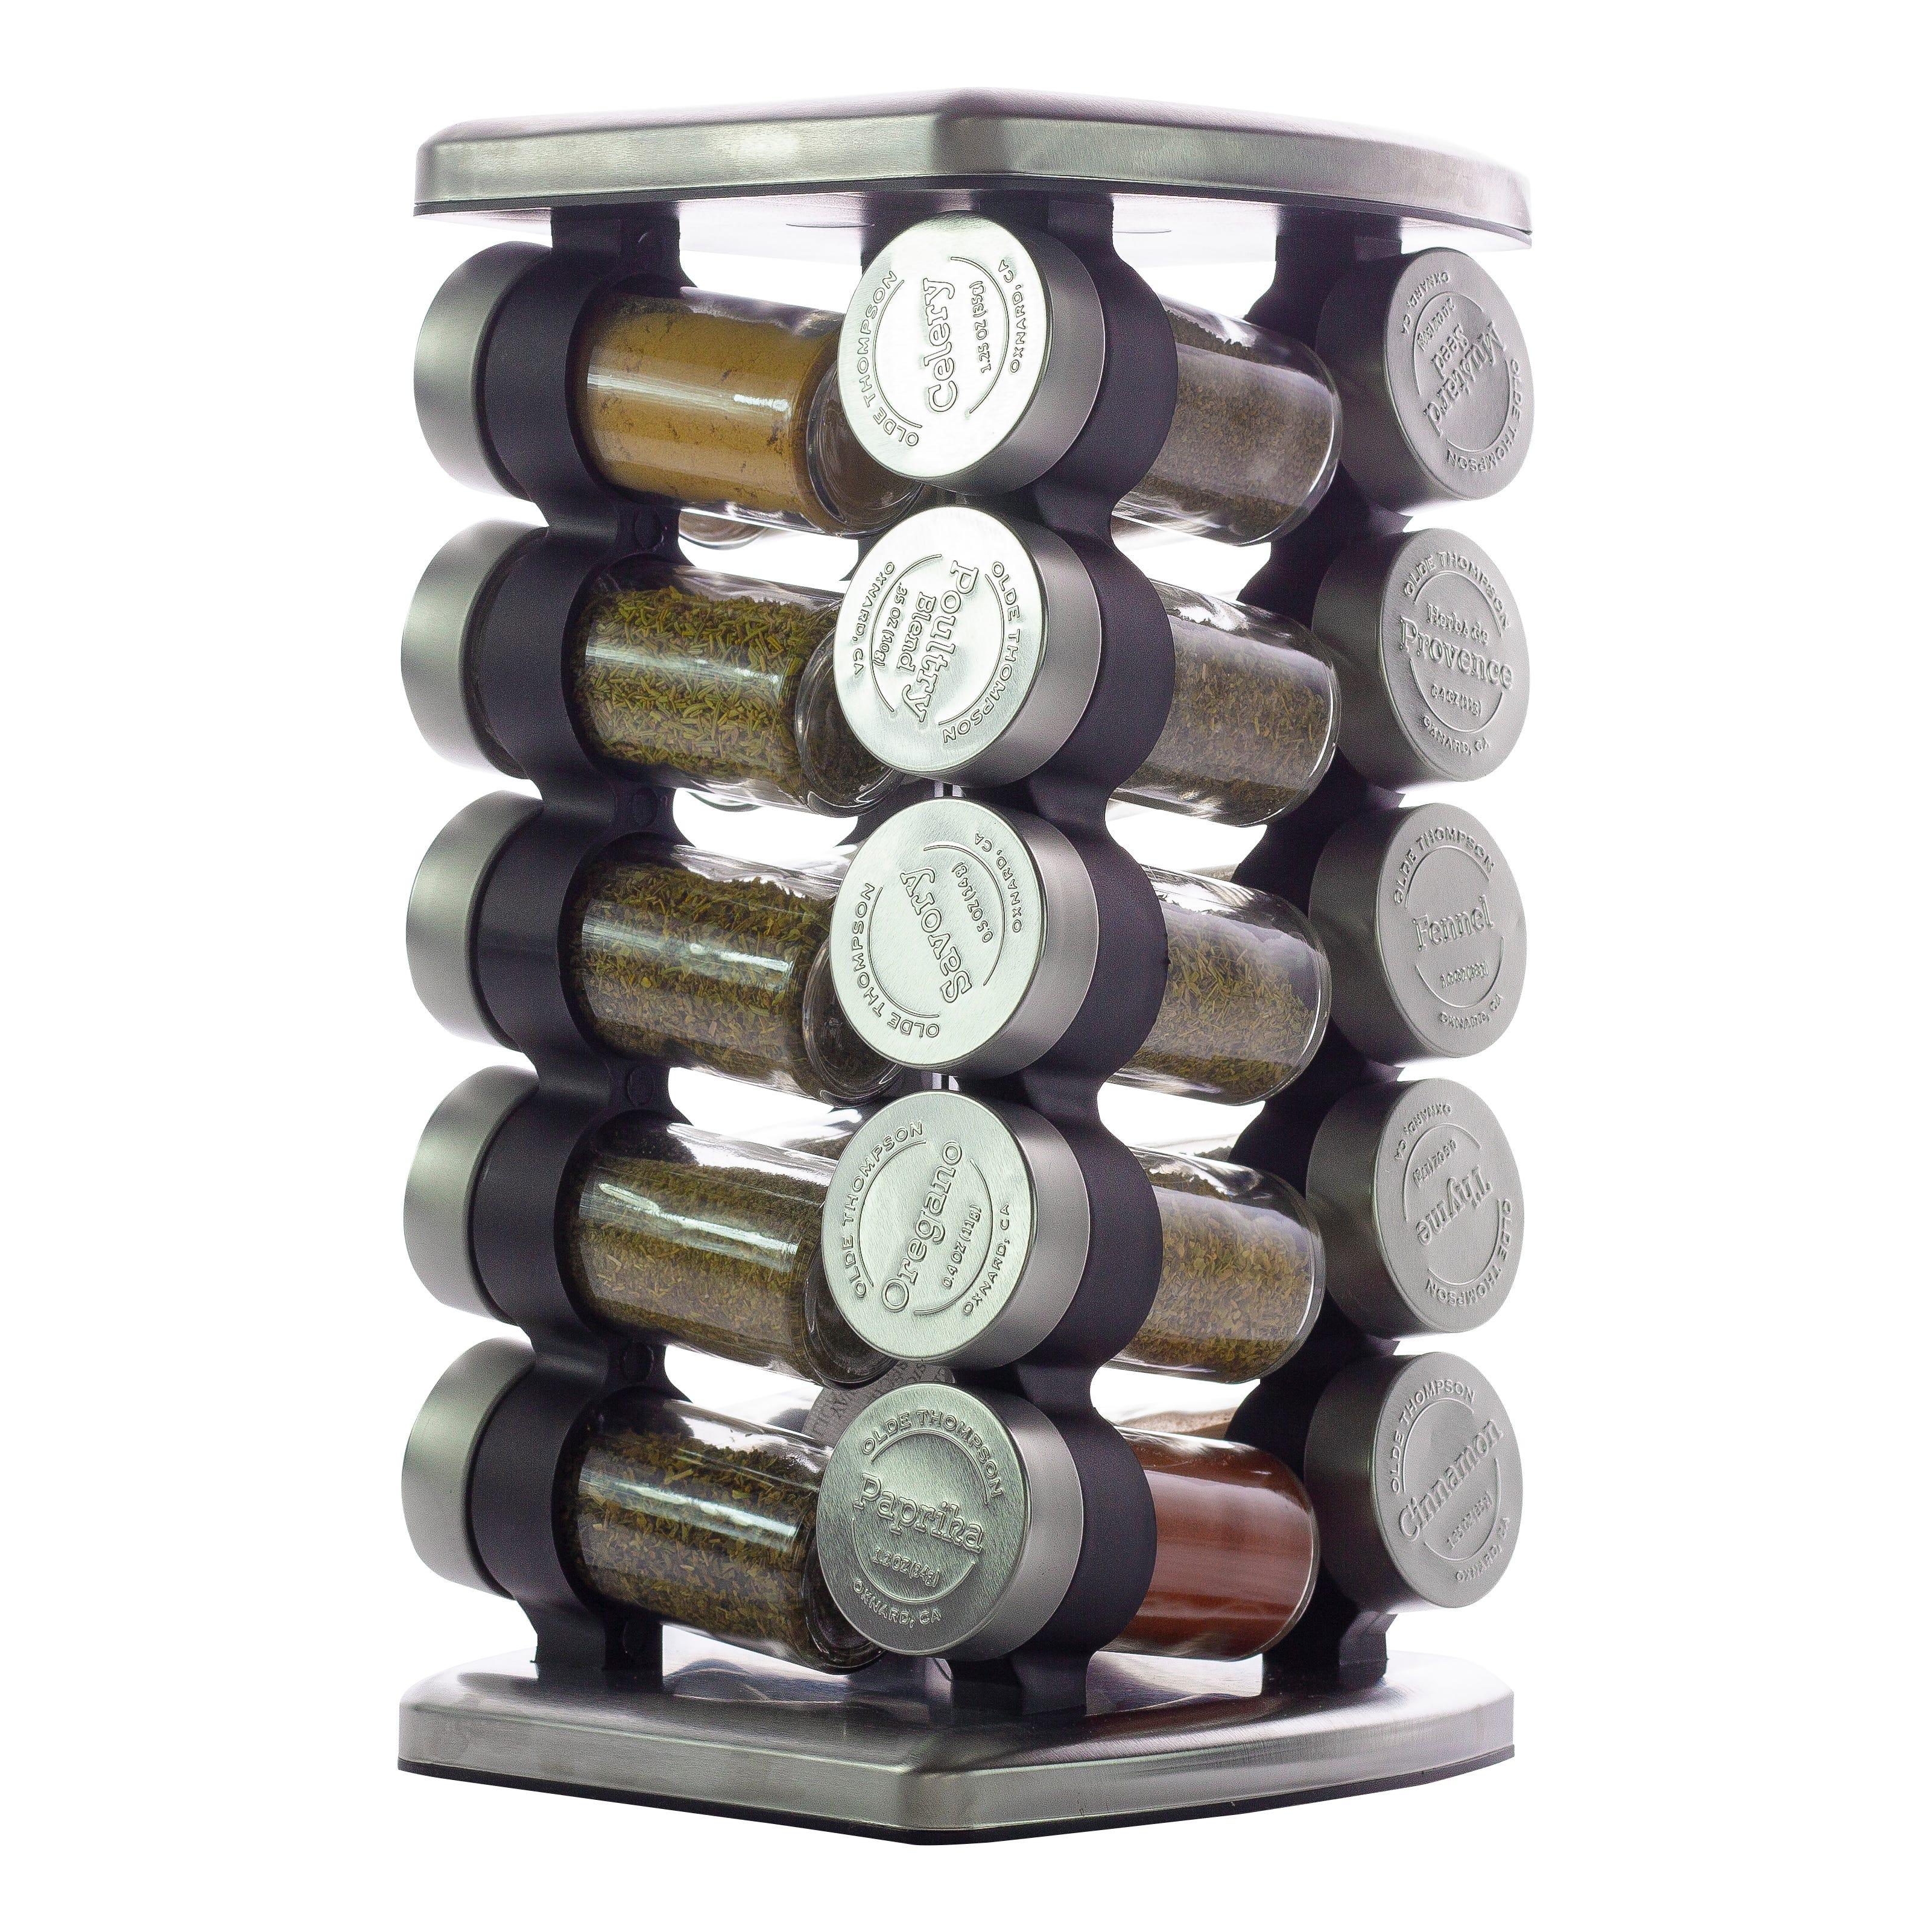 Especiero de acero inoxidable Olde Thompson® giratorio con 20 frascos